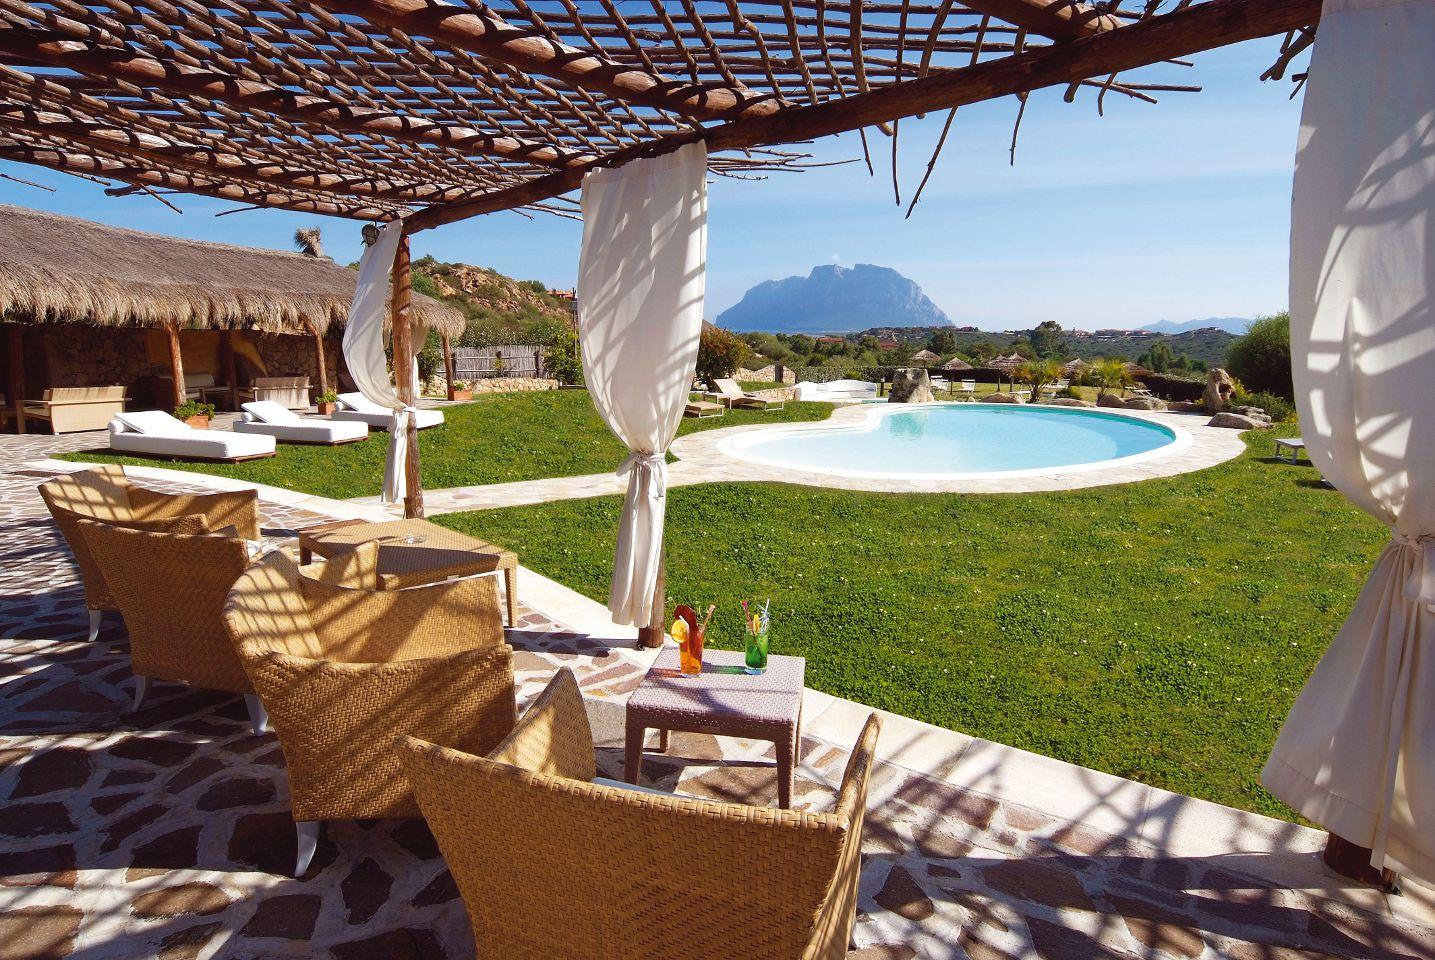 Hotel ollastu olbia sardaigne italie for Hotels sardaigne